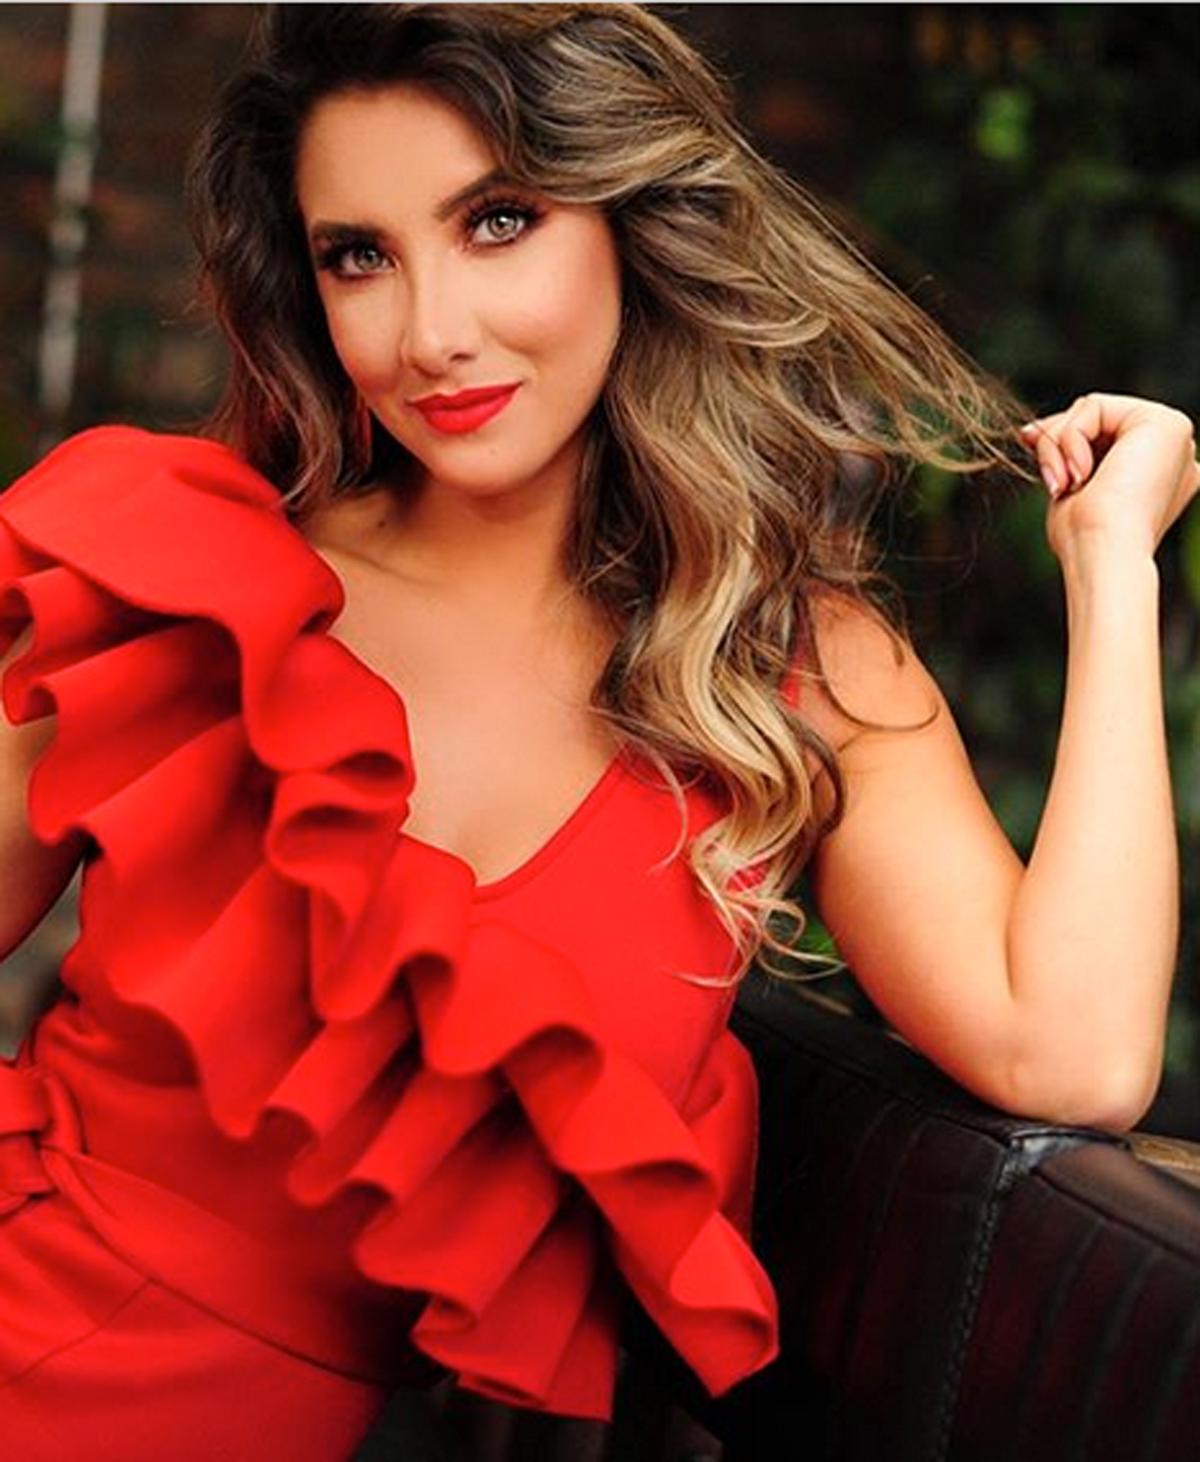 Daniella Alvarez